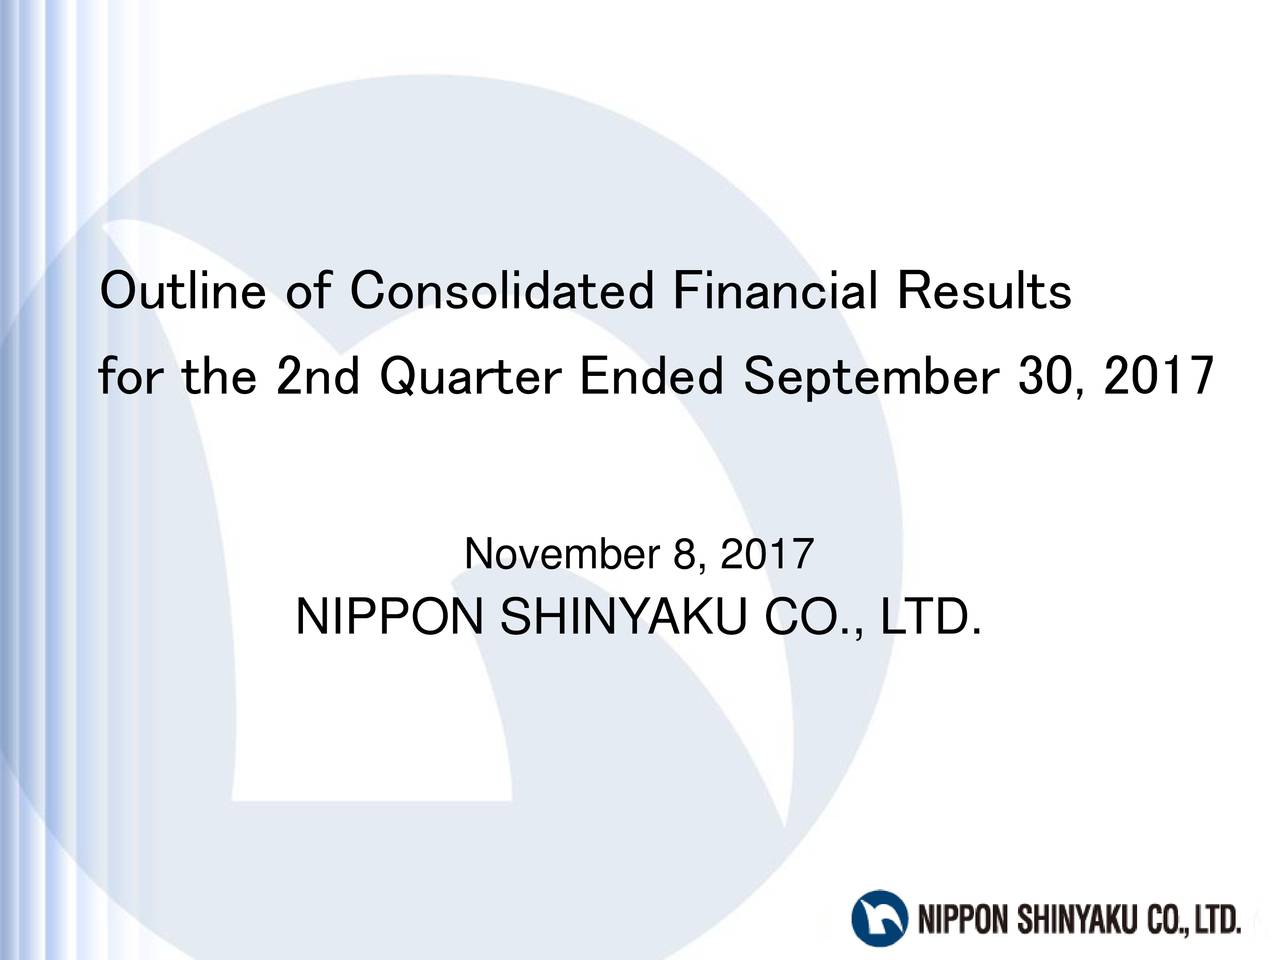 for the 2nd Quarter Ended September 30, 2017 November 8, 2017 NIPPON SHINYAKU CO., LTD.